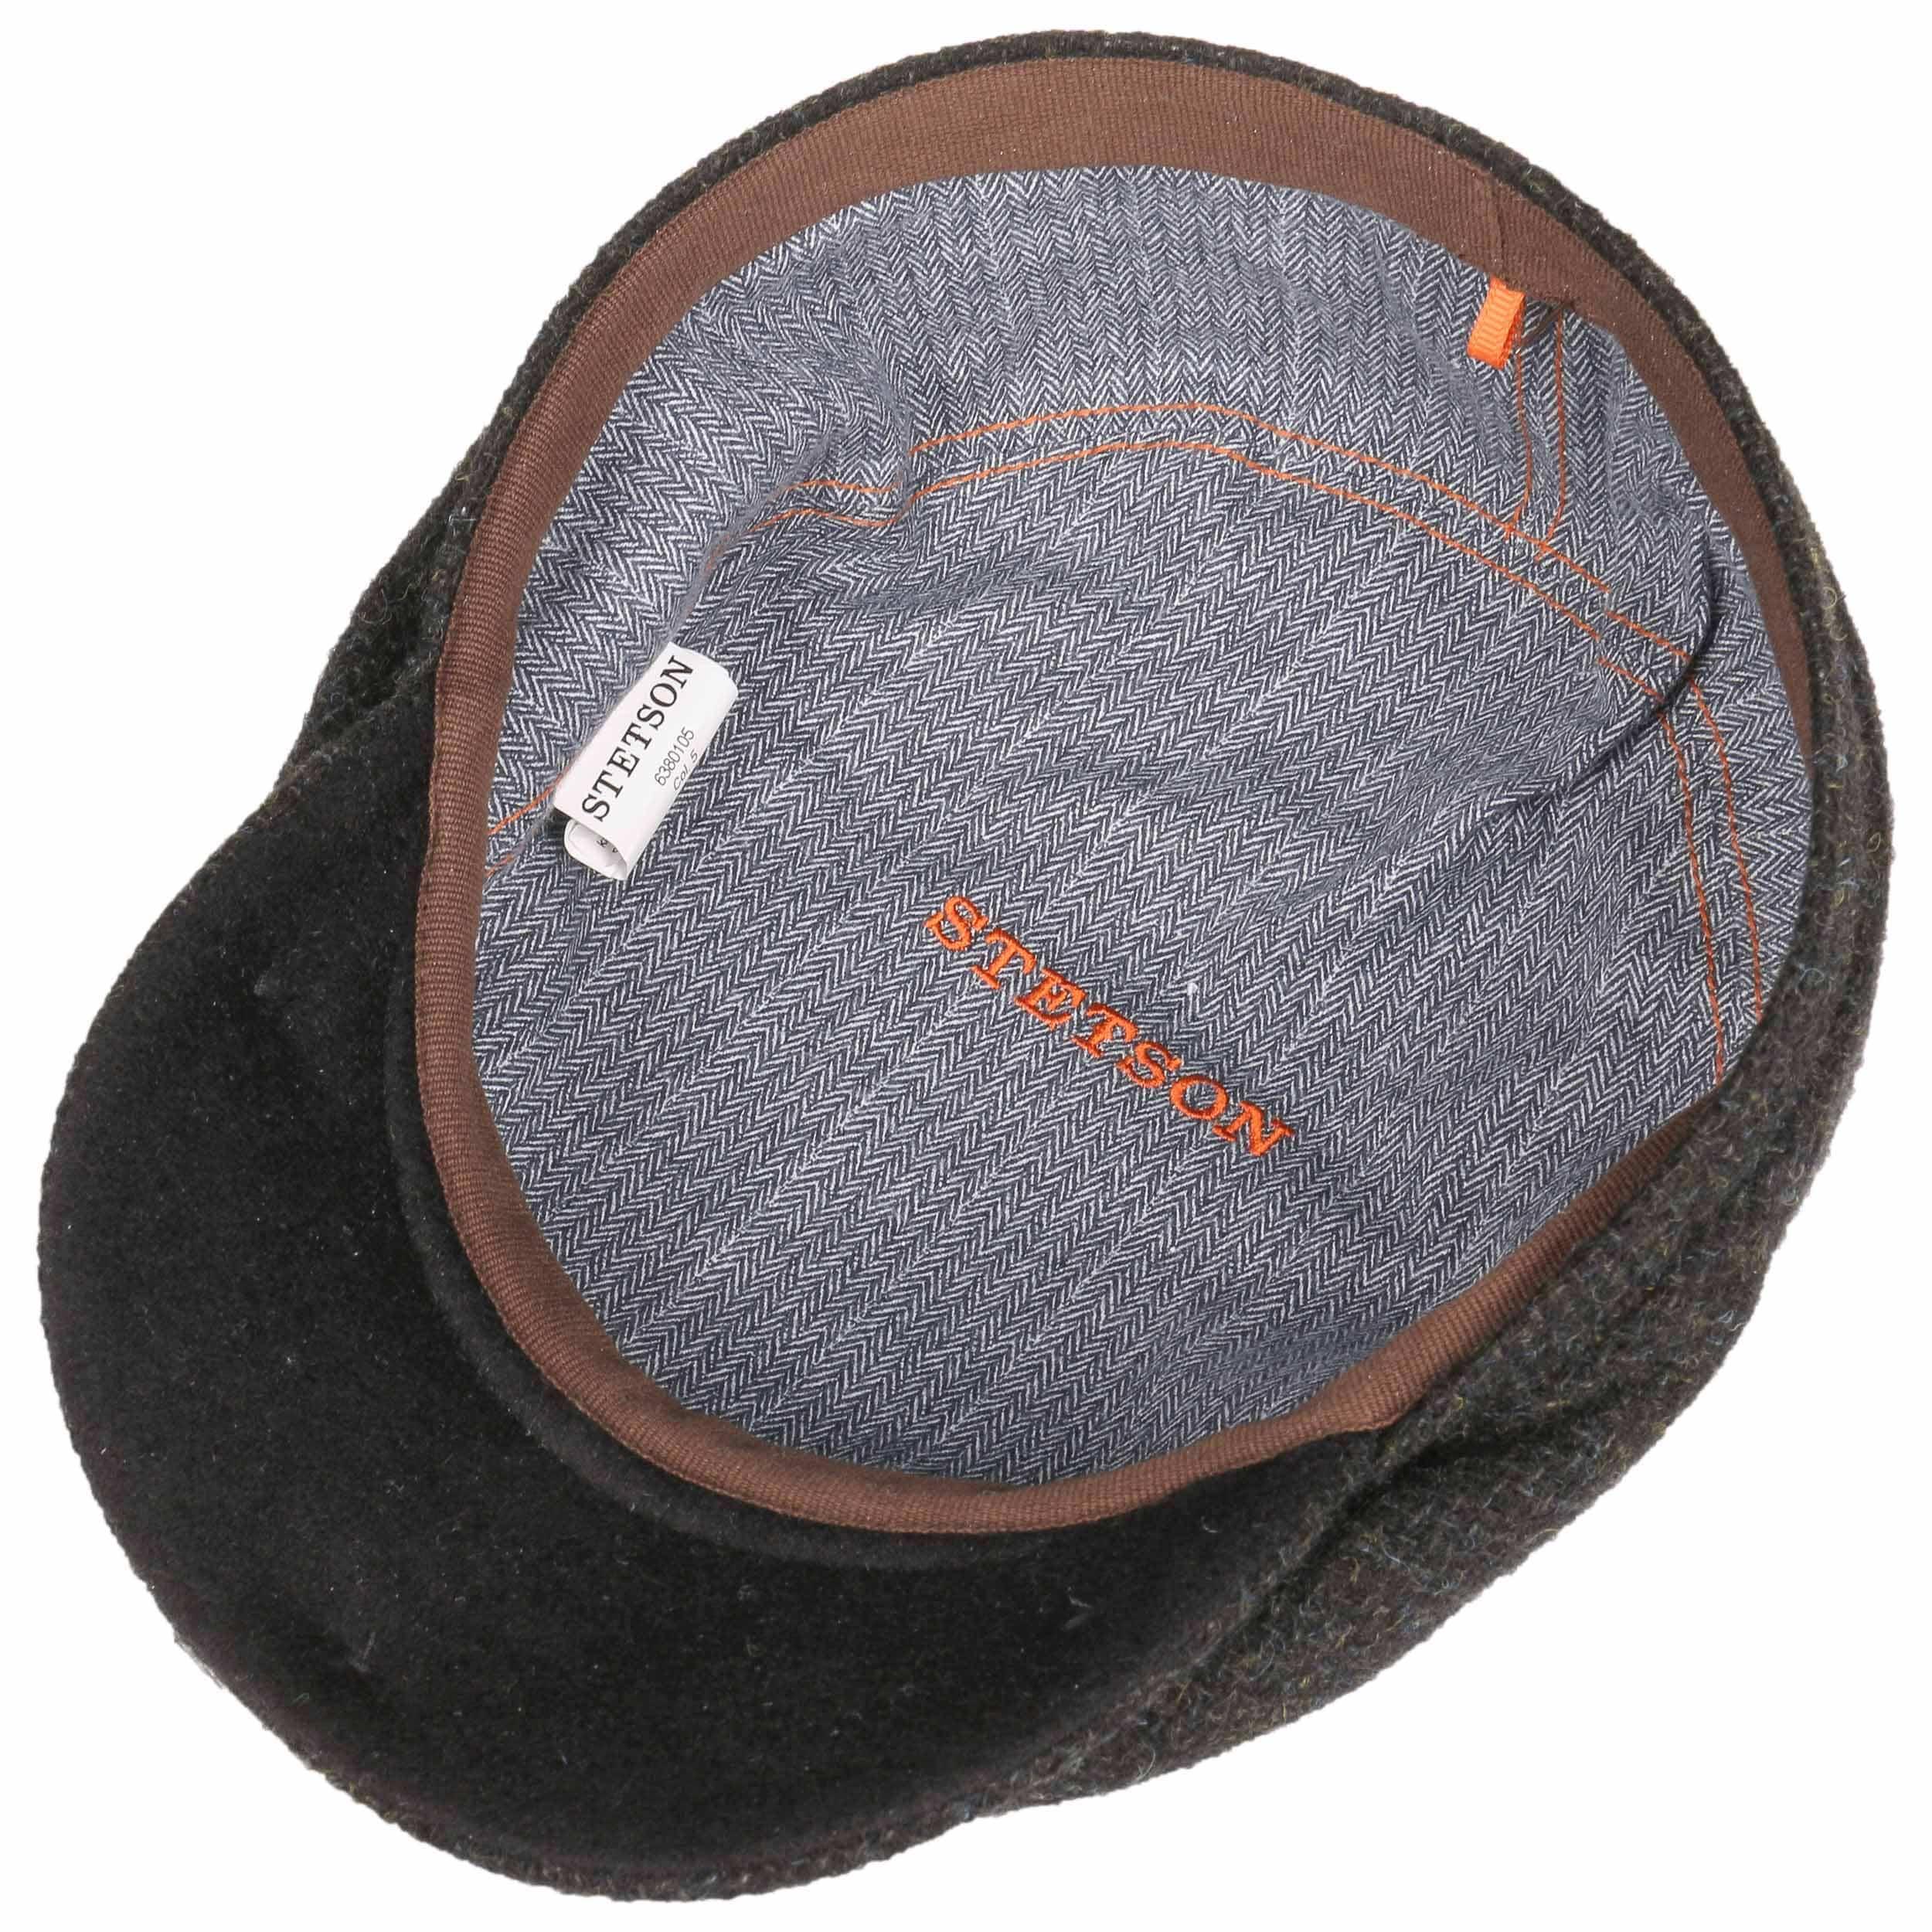 ... Belfast Tweed Flatcap by Stetson - schwarz 2 ... 00e8dbfb7e13